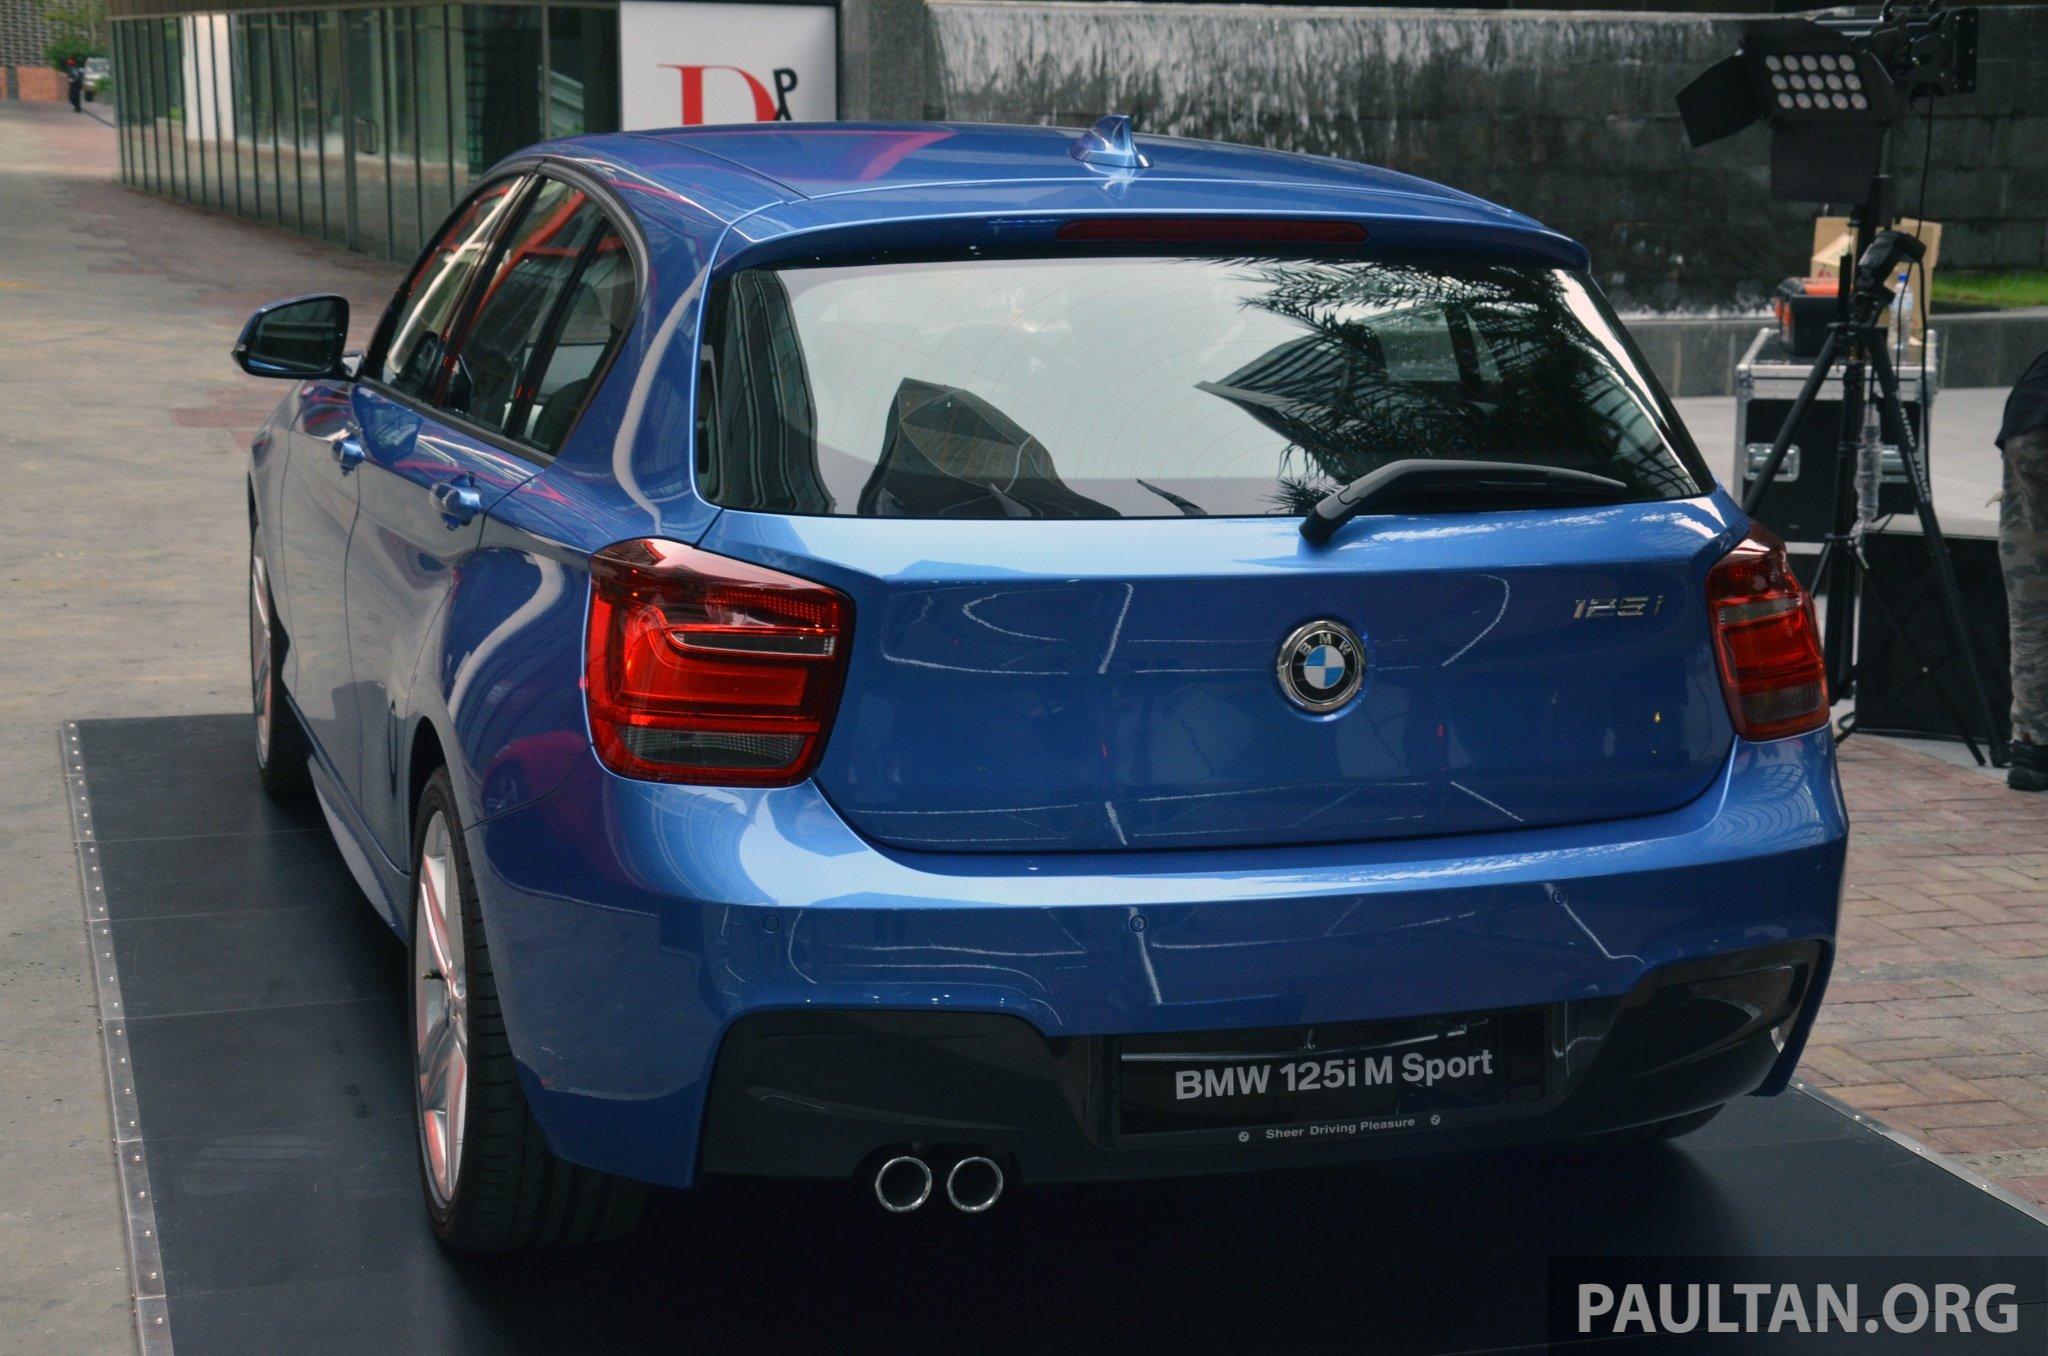 Bmw 125i m Sport Blue F20 Bmw 125i m Sport 10